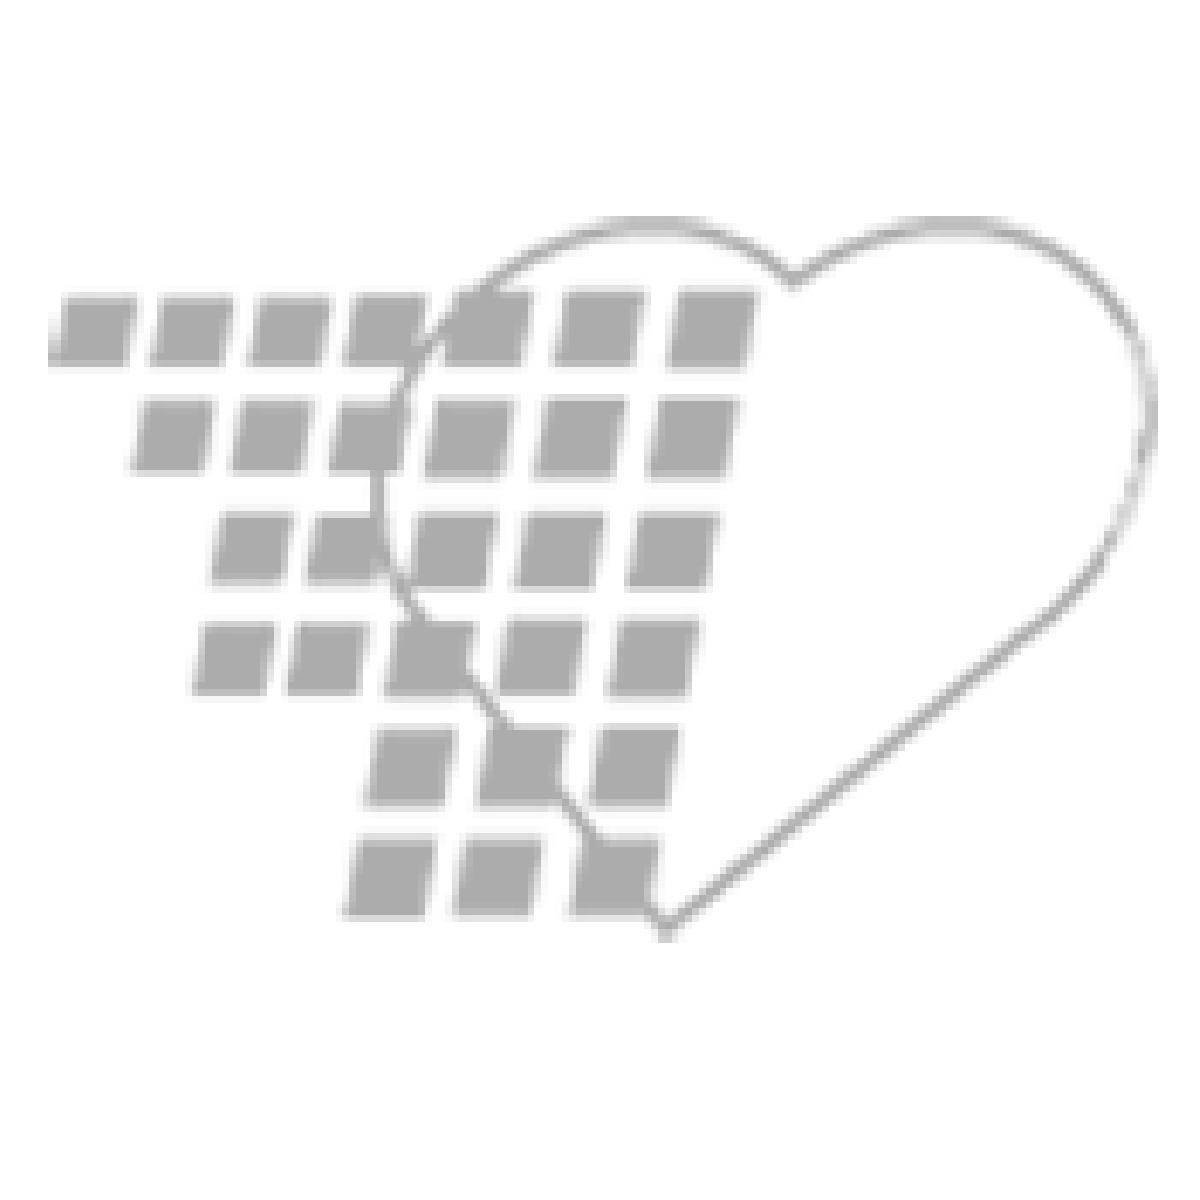 11-81-0450 Laerdal Nursing Anne Fundus Skills and Assessment Module